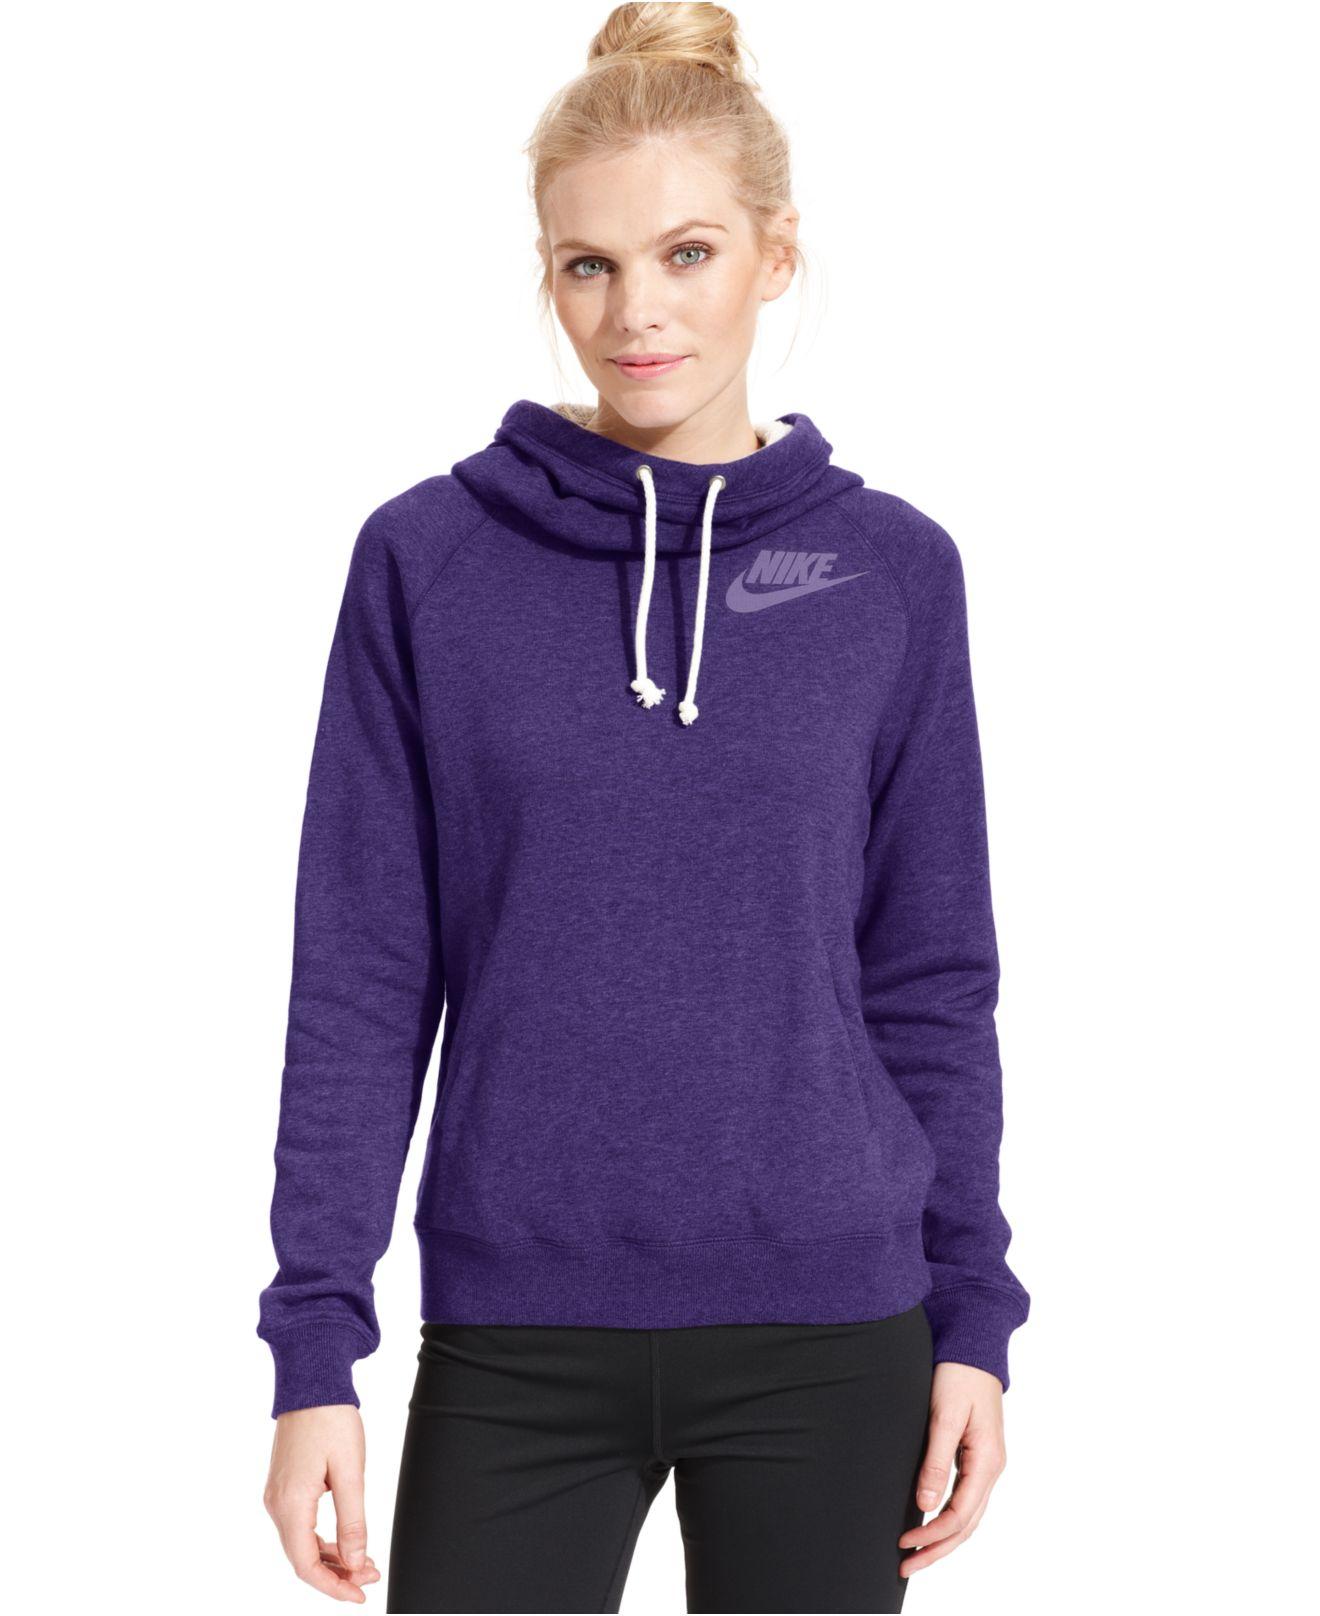 Nike Rally Funnel-Neck Sweatshirt Hoodie in Purple | Lyst